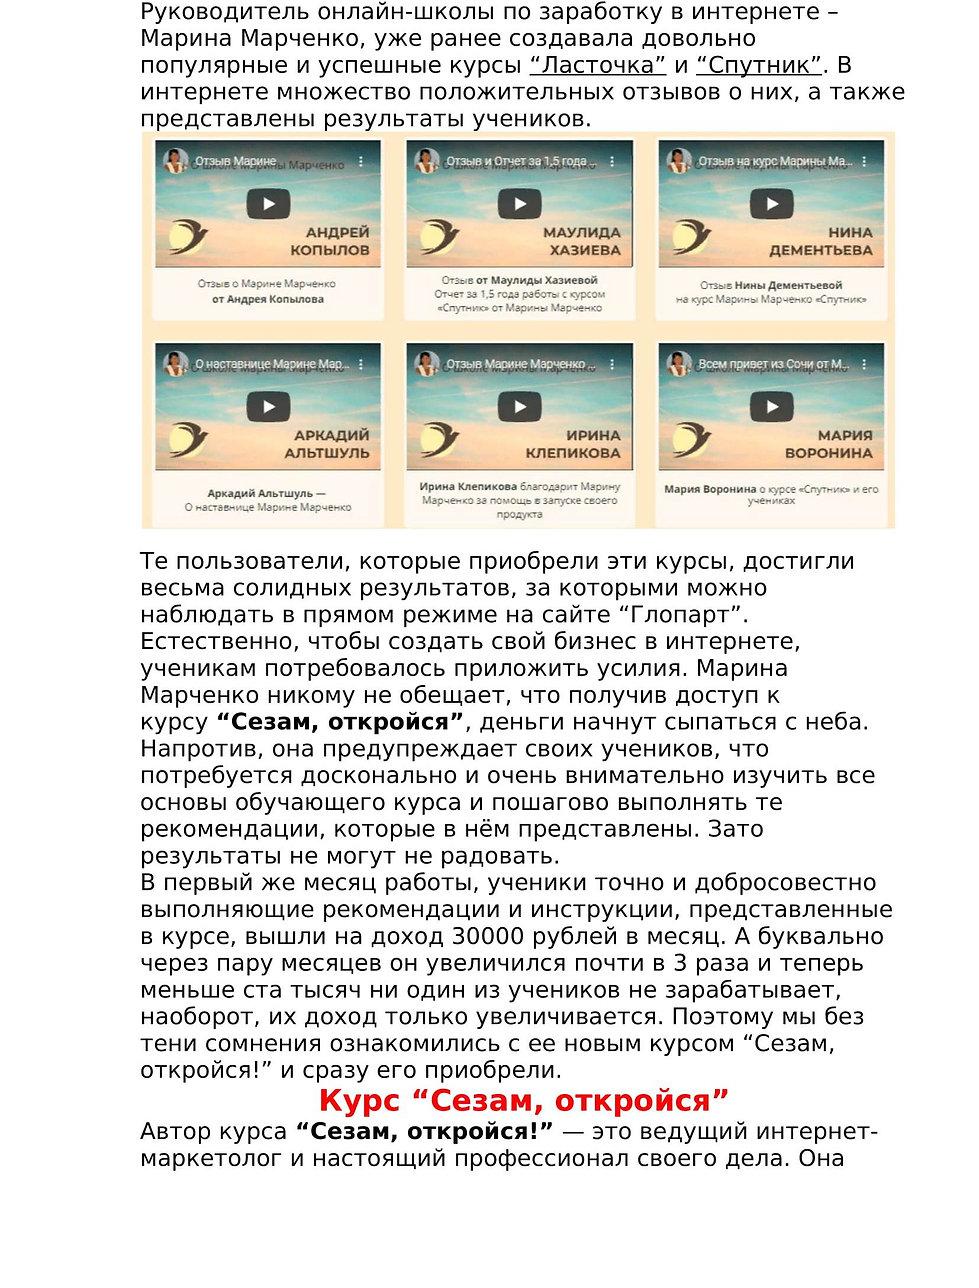 СезамОткройся (2).jpg